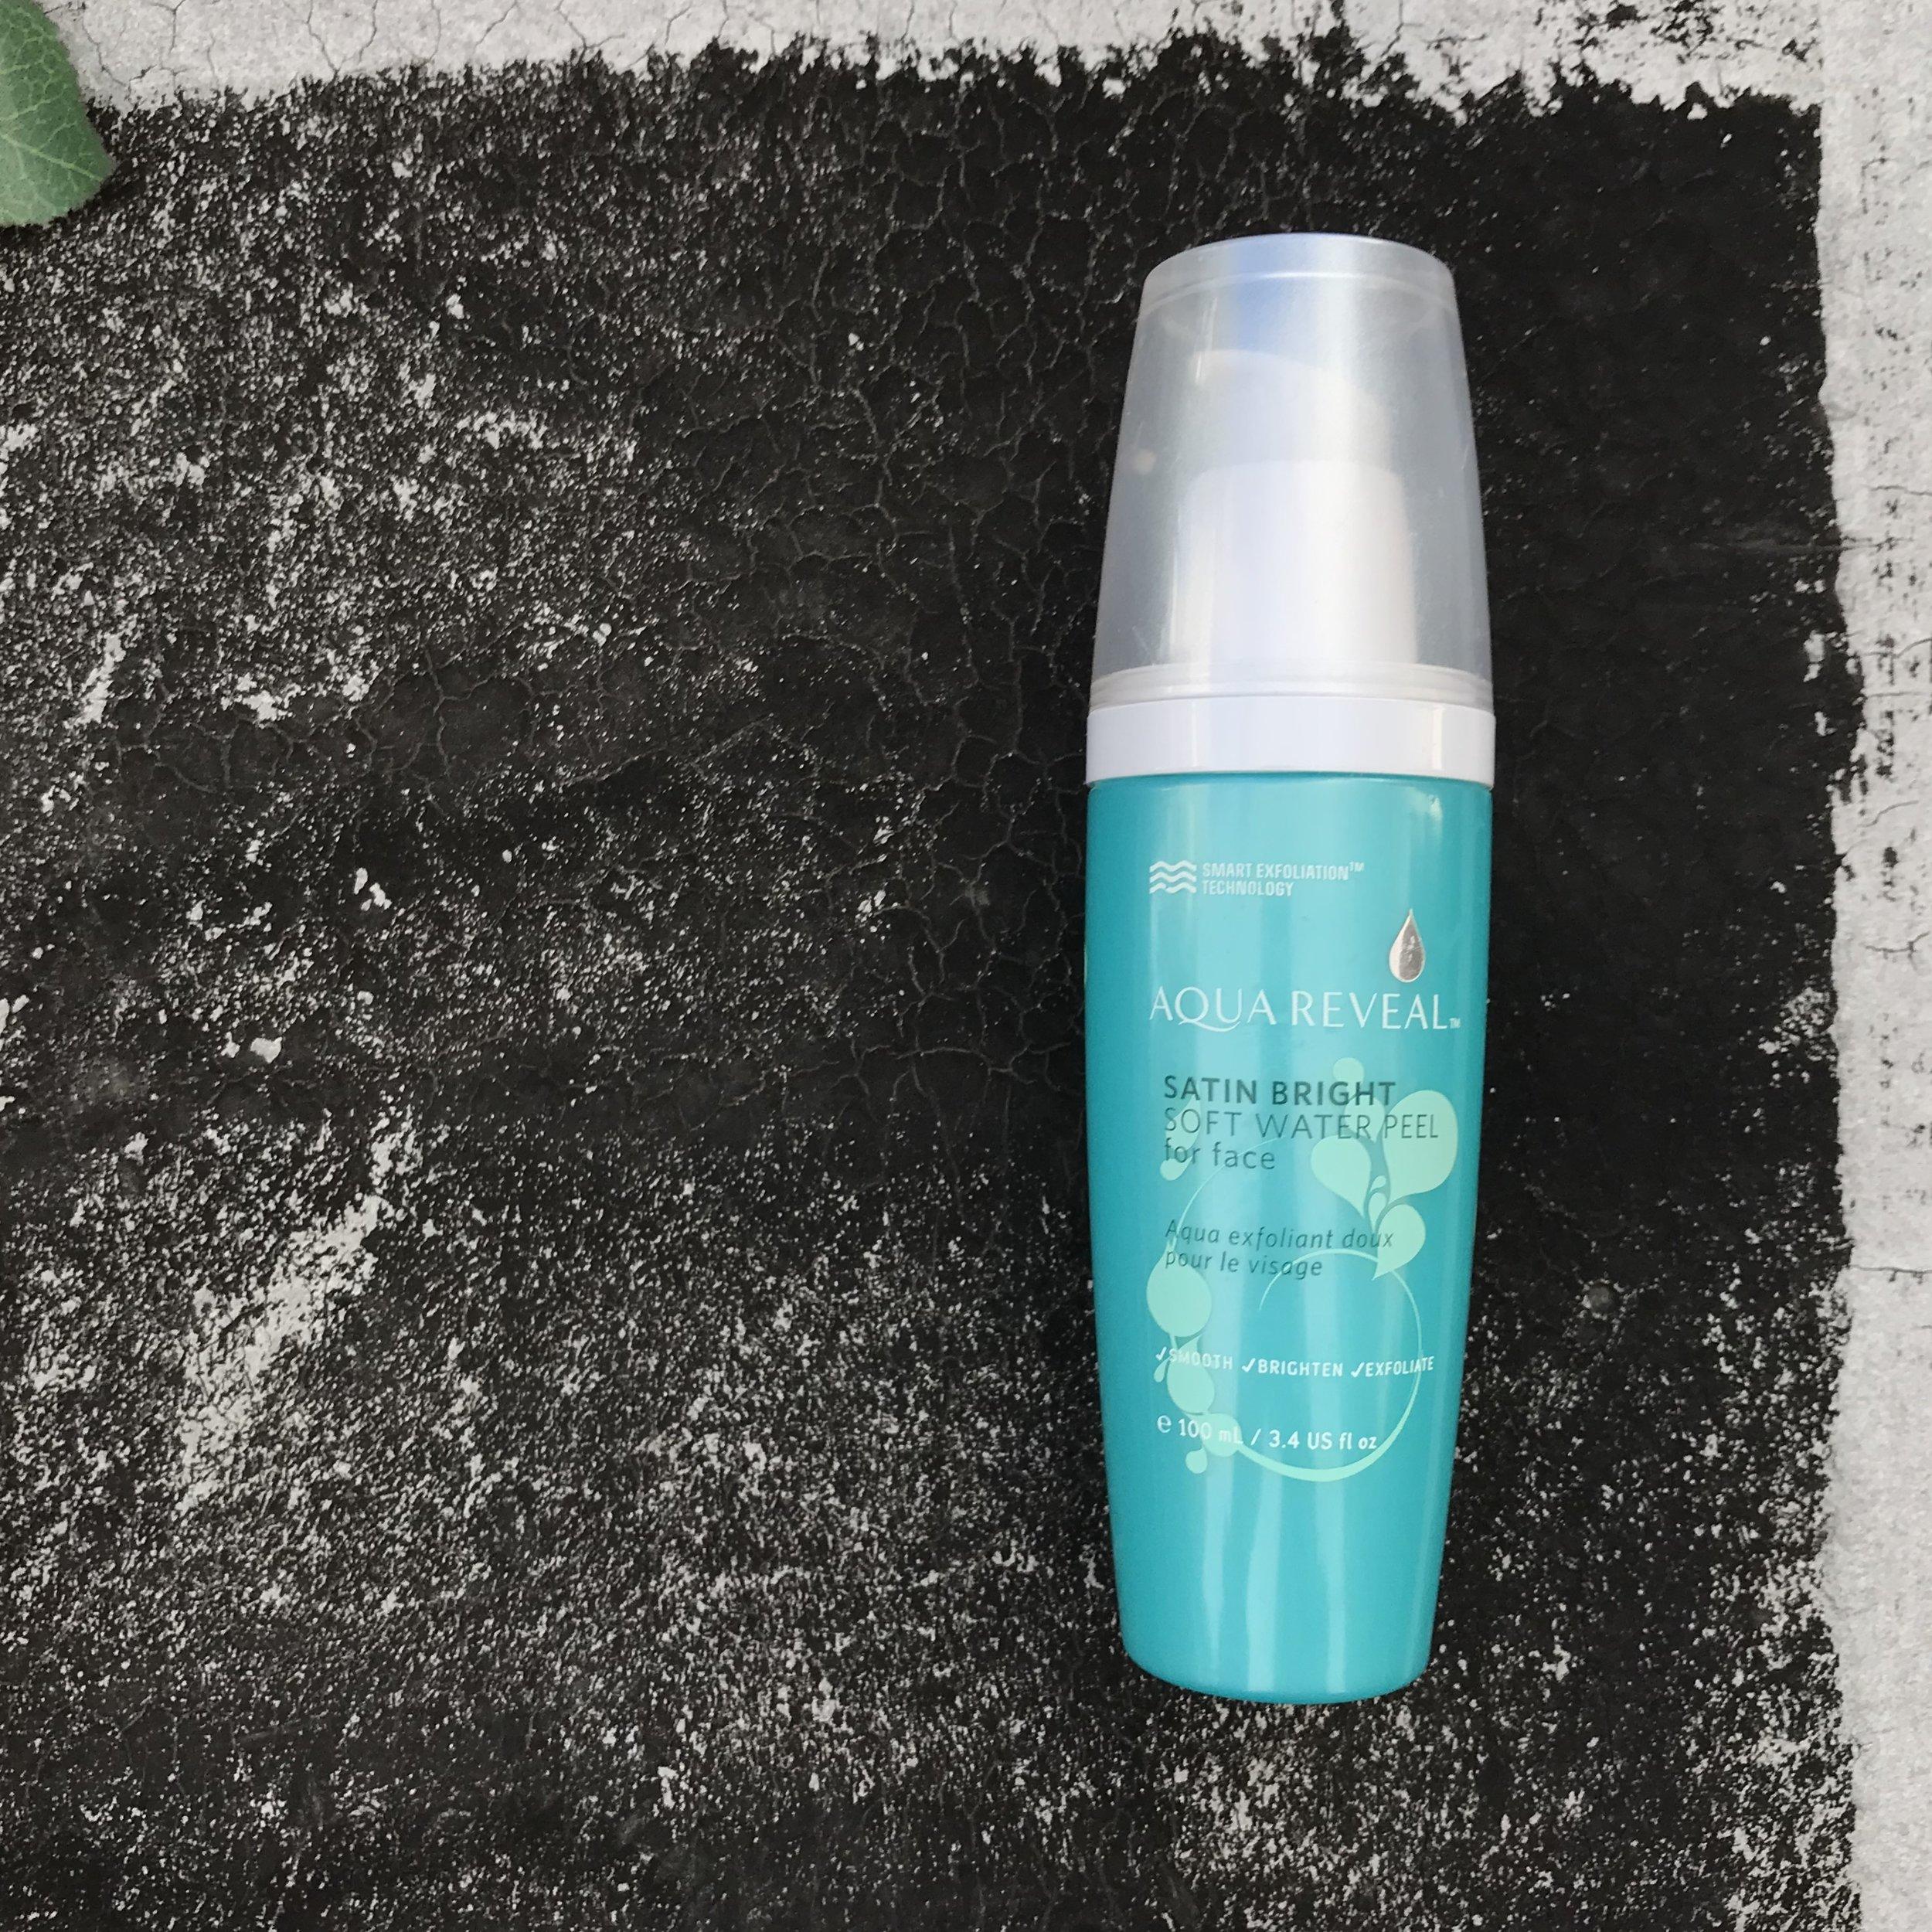 aqua reveal satin bright soft water peel.jpg